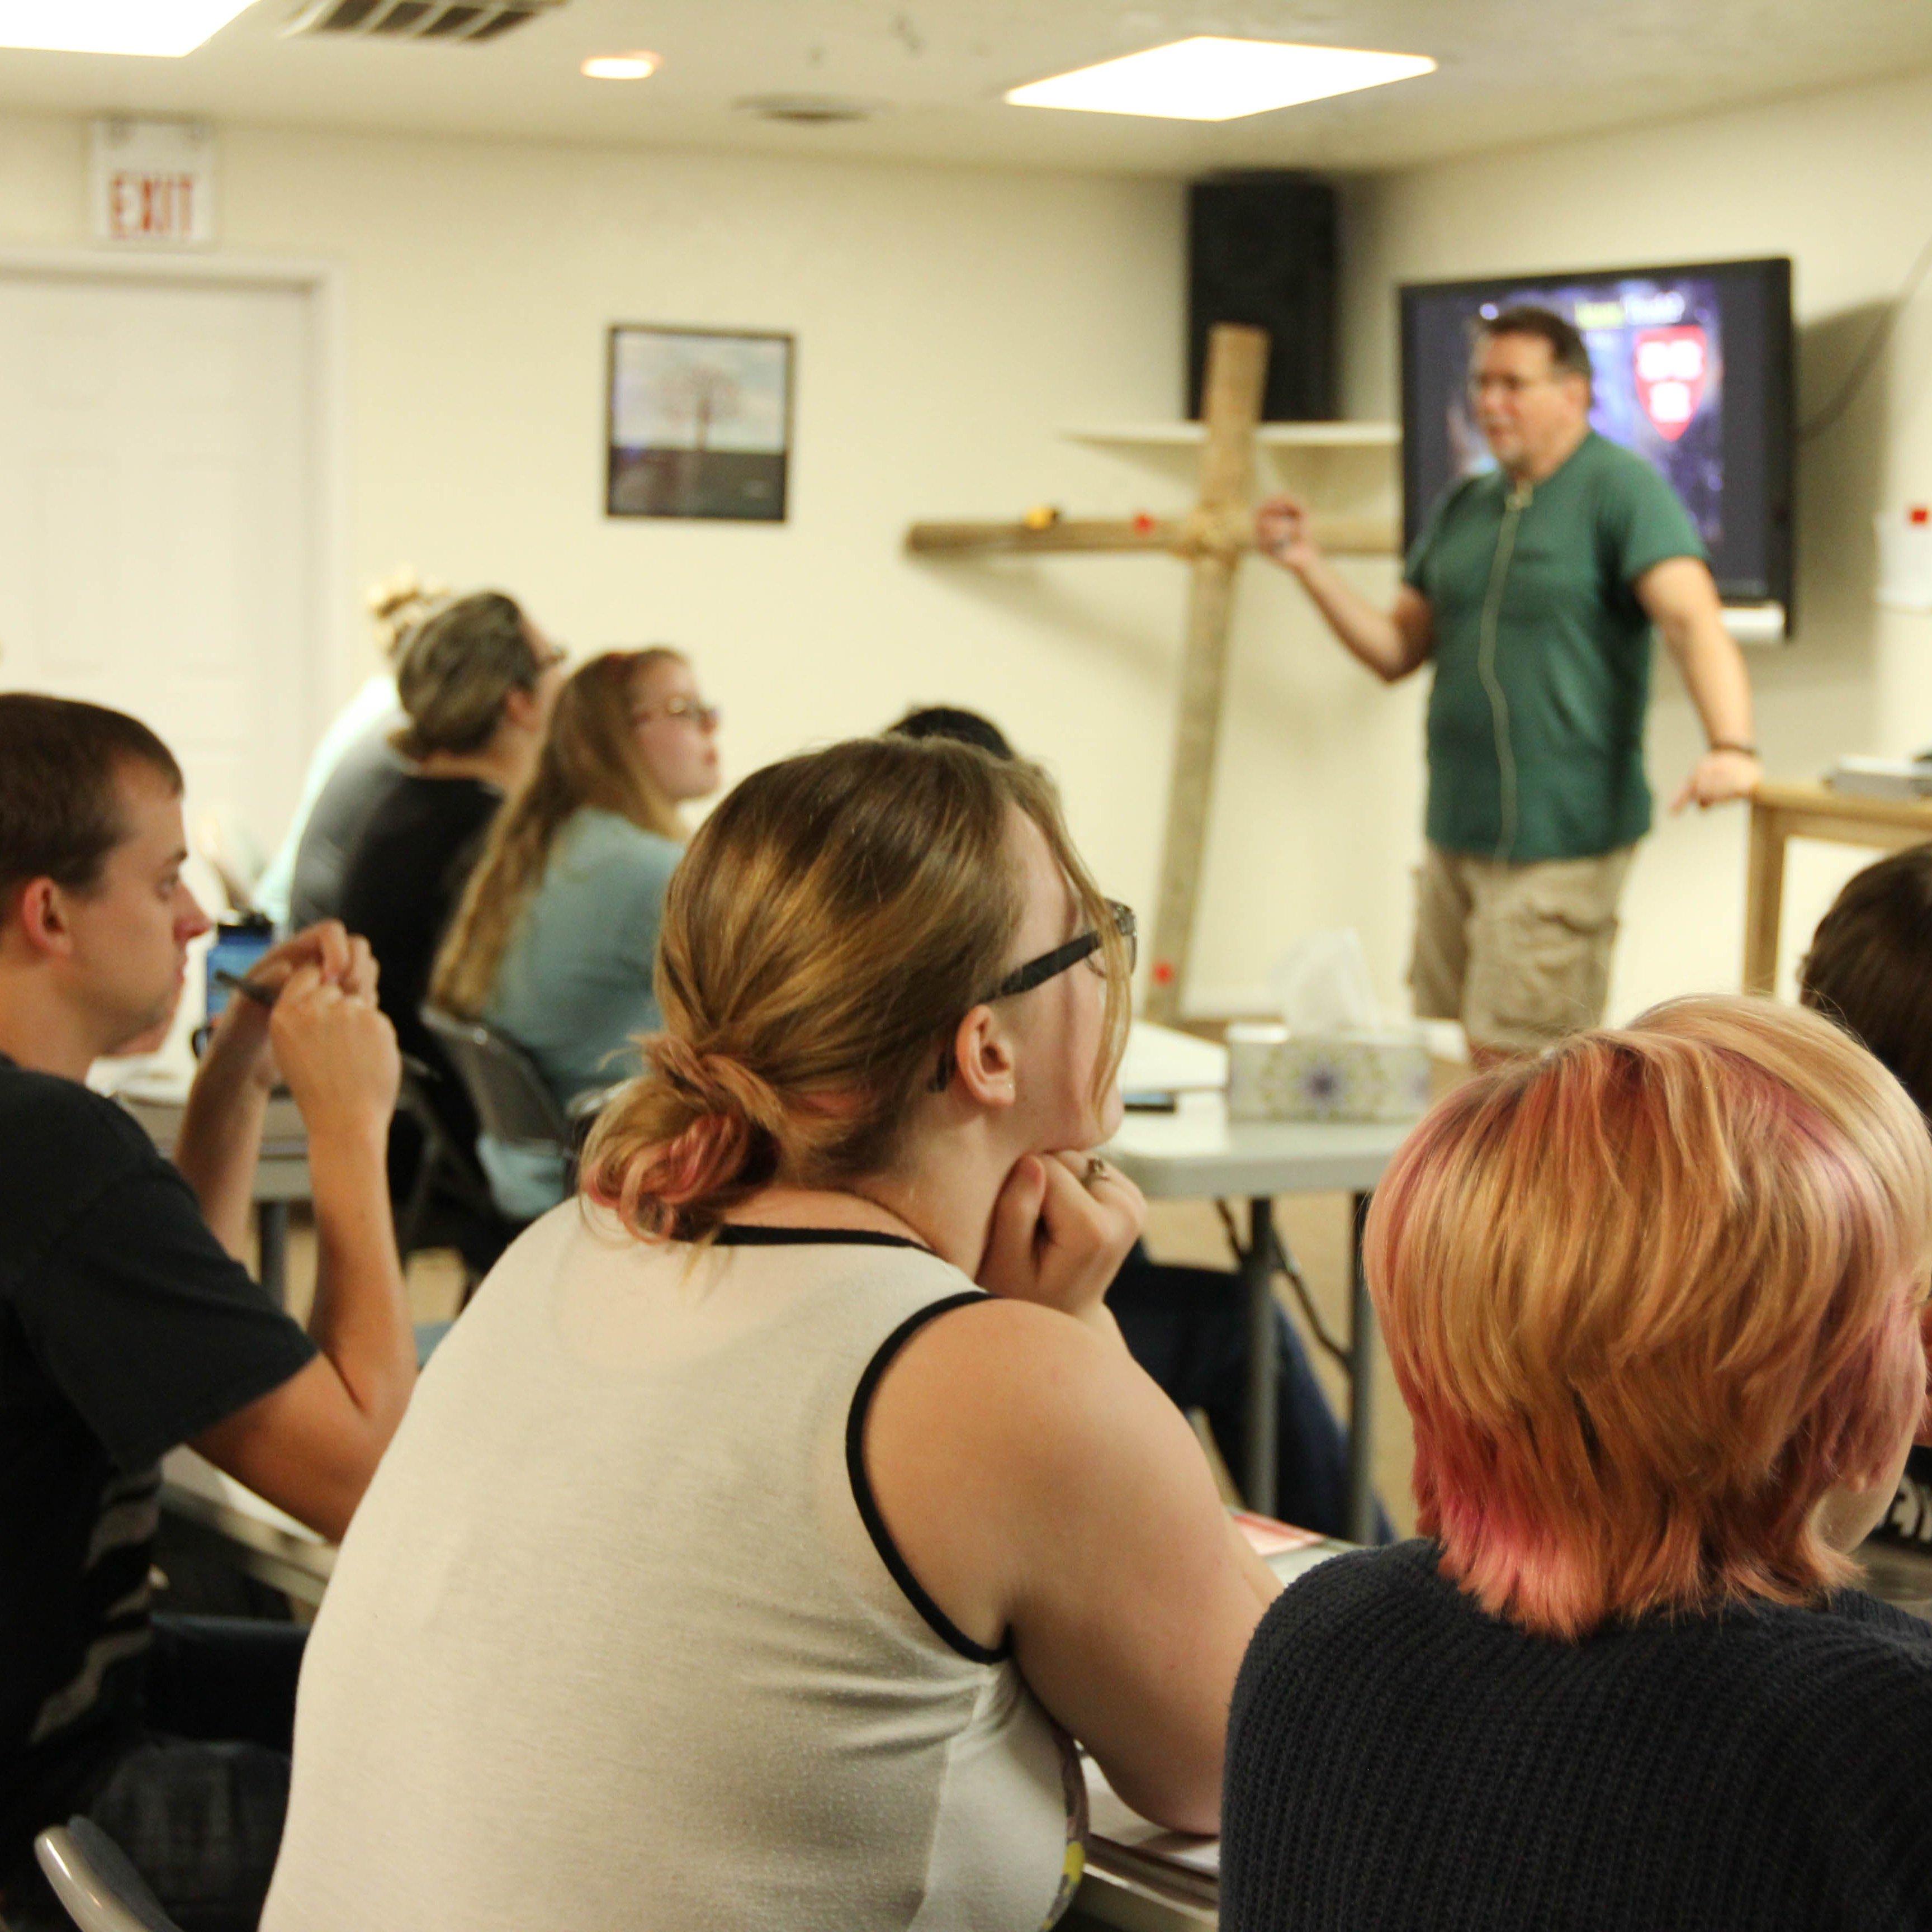 ywam-tyler-missionary-discipleship-training-school-classroom-don-stephens